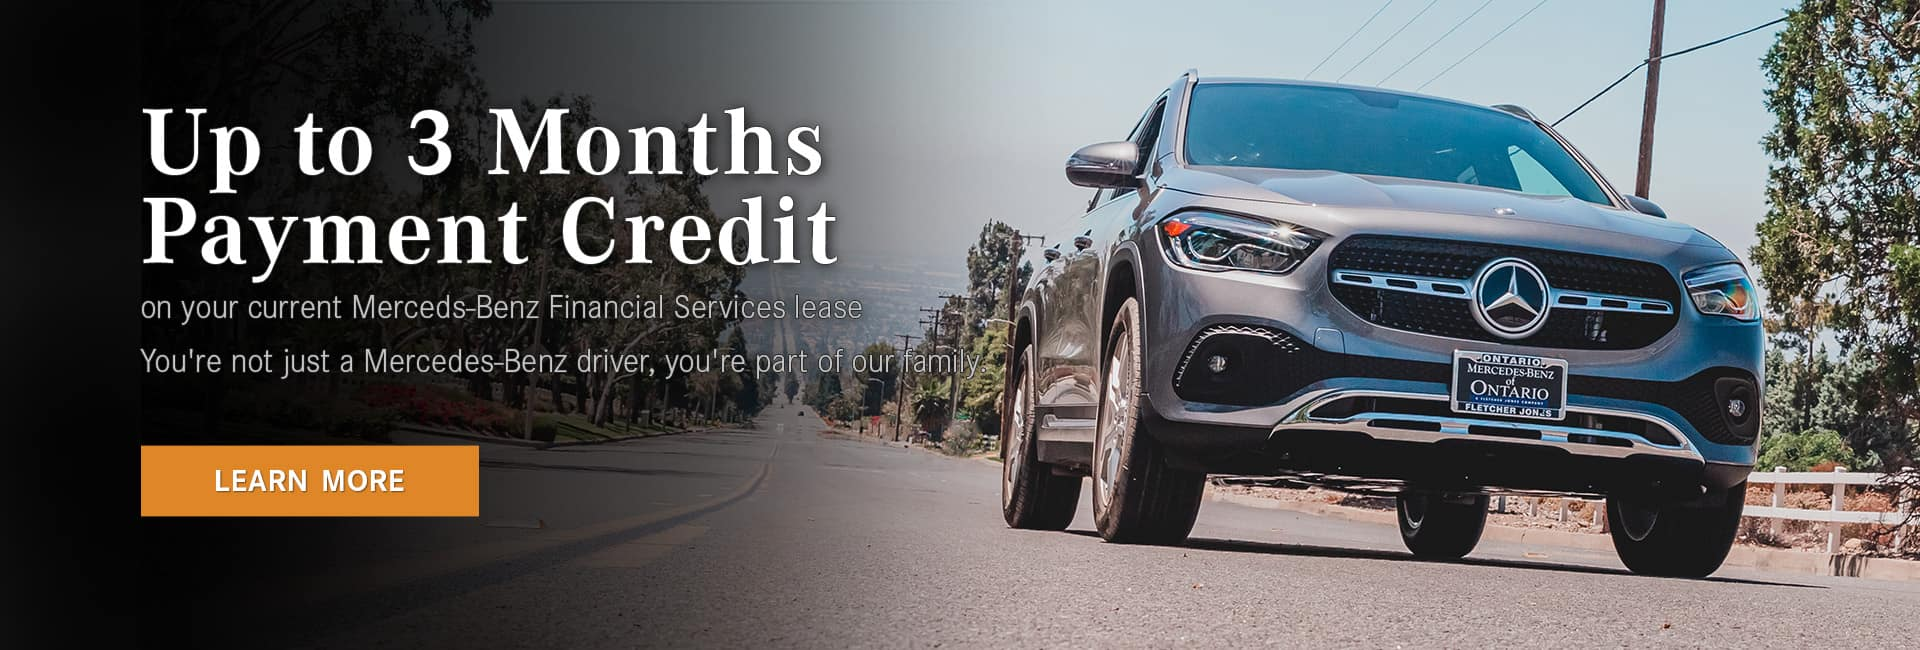 MB Payment Credit Slider 1920×650 Ontario